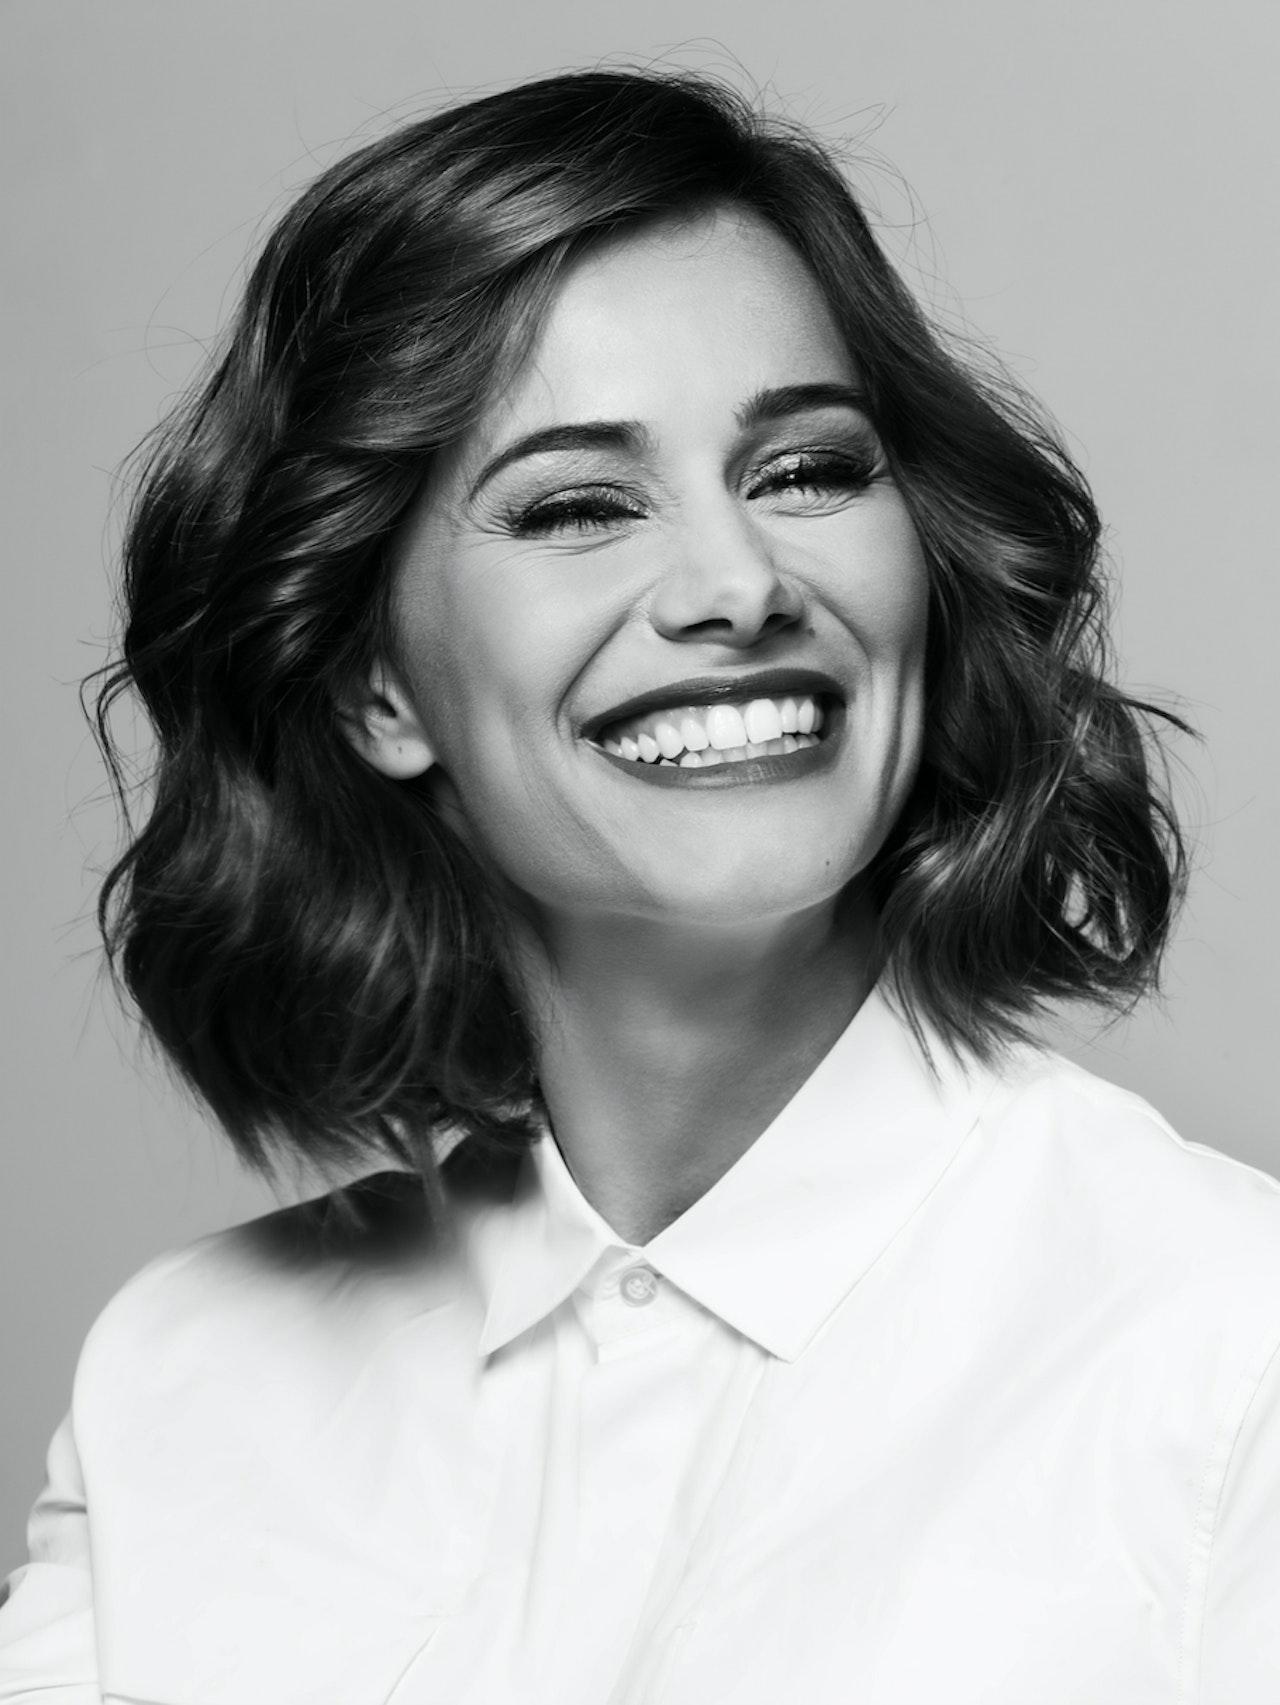 'Claudia Vieira'